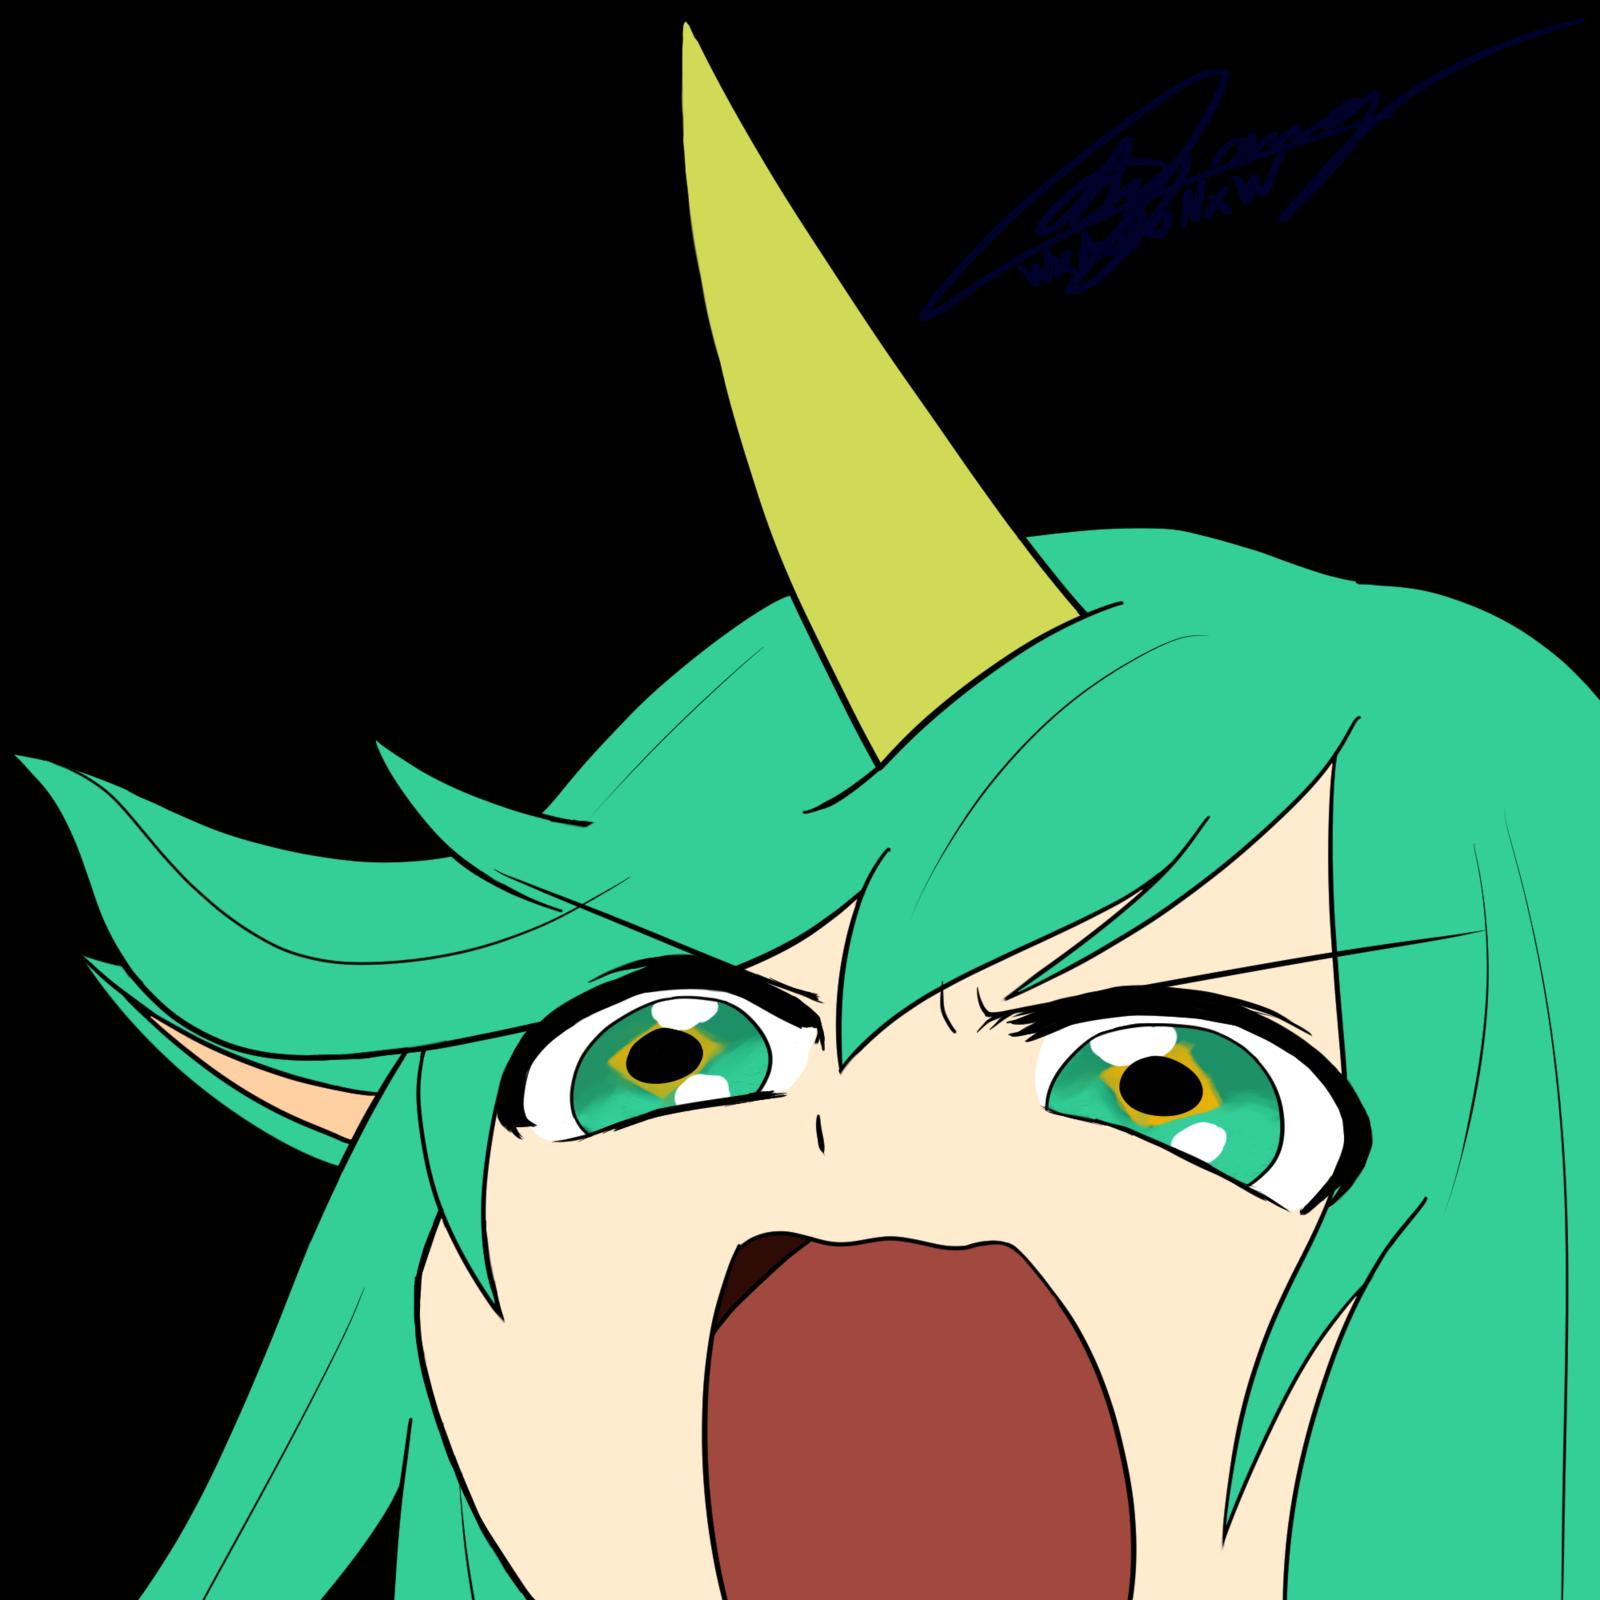 download Angry Soraka Noises